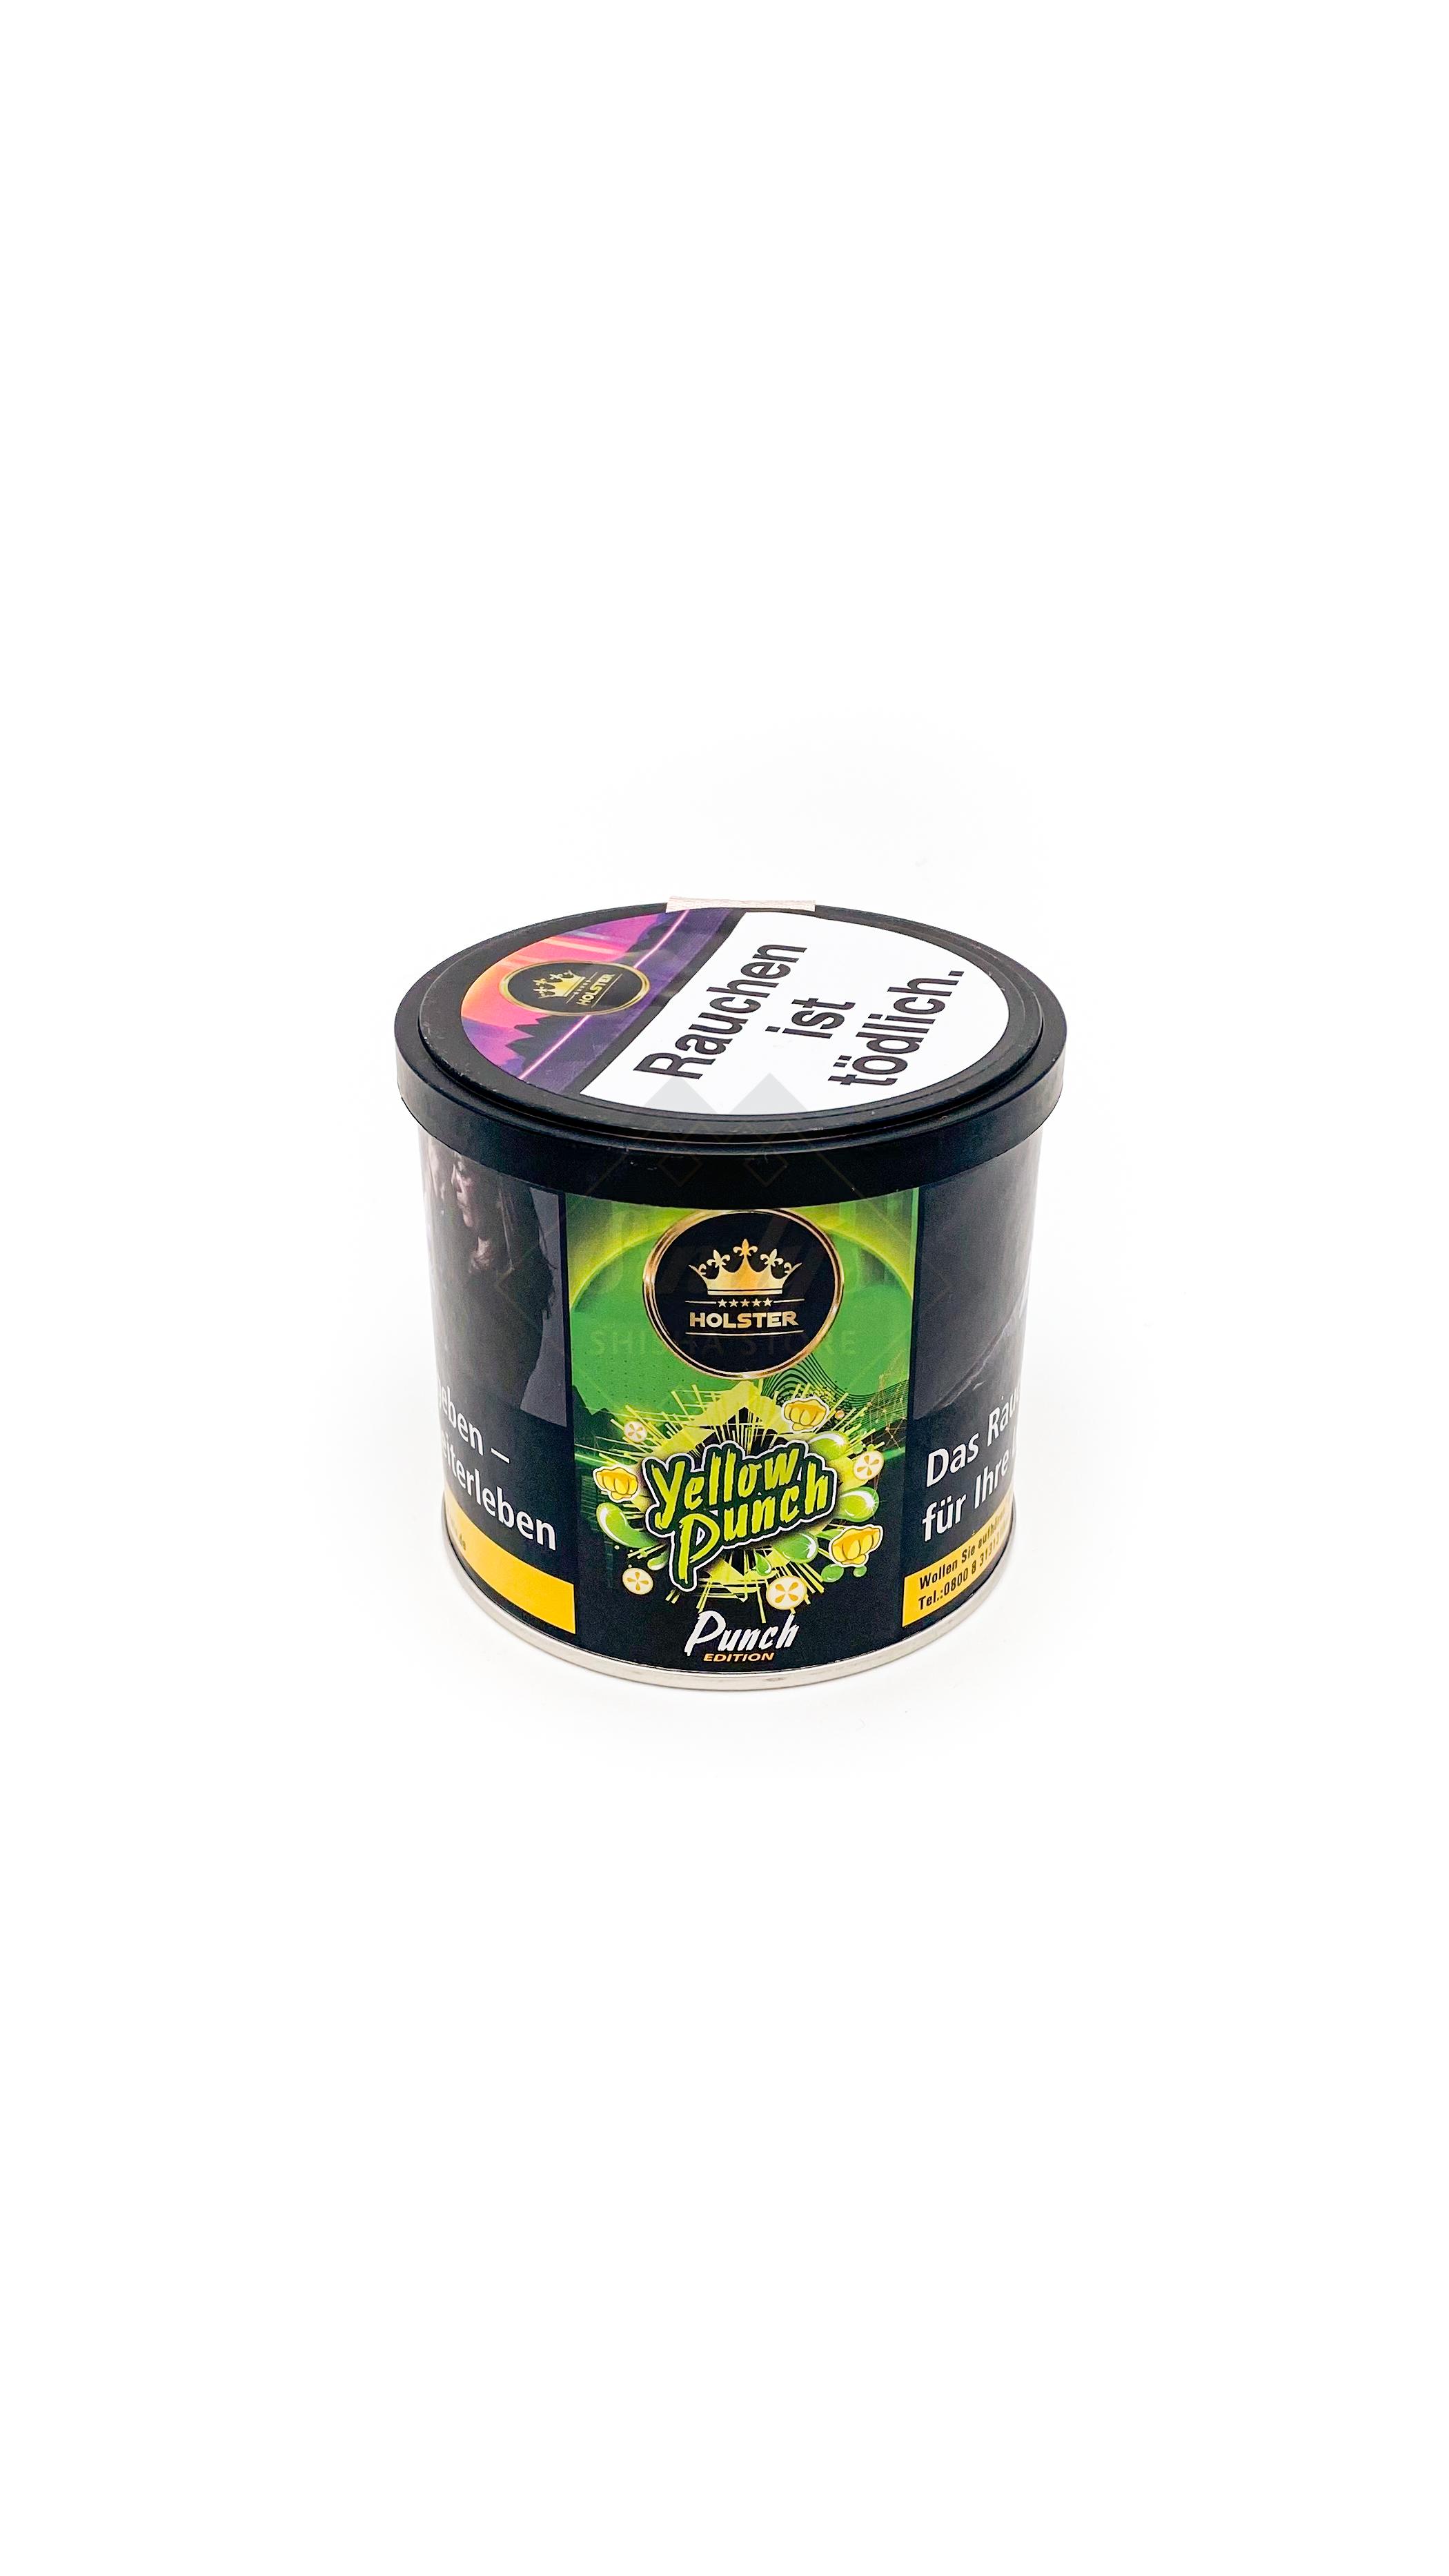 Holster Tabak - Yellow Punch (200g)